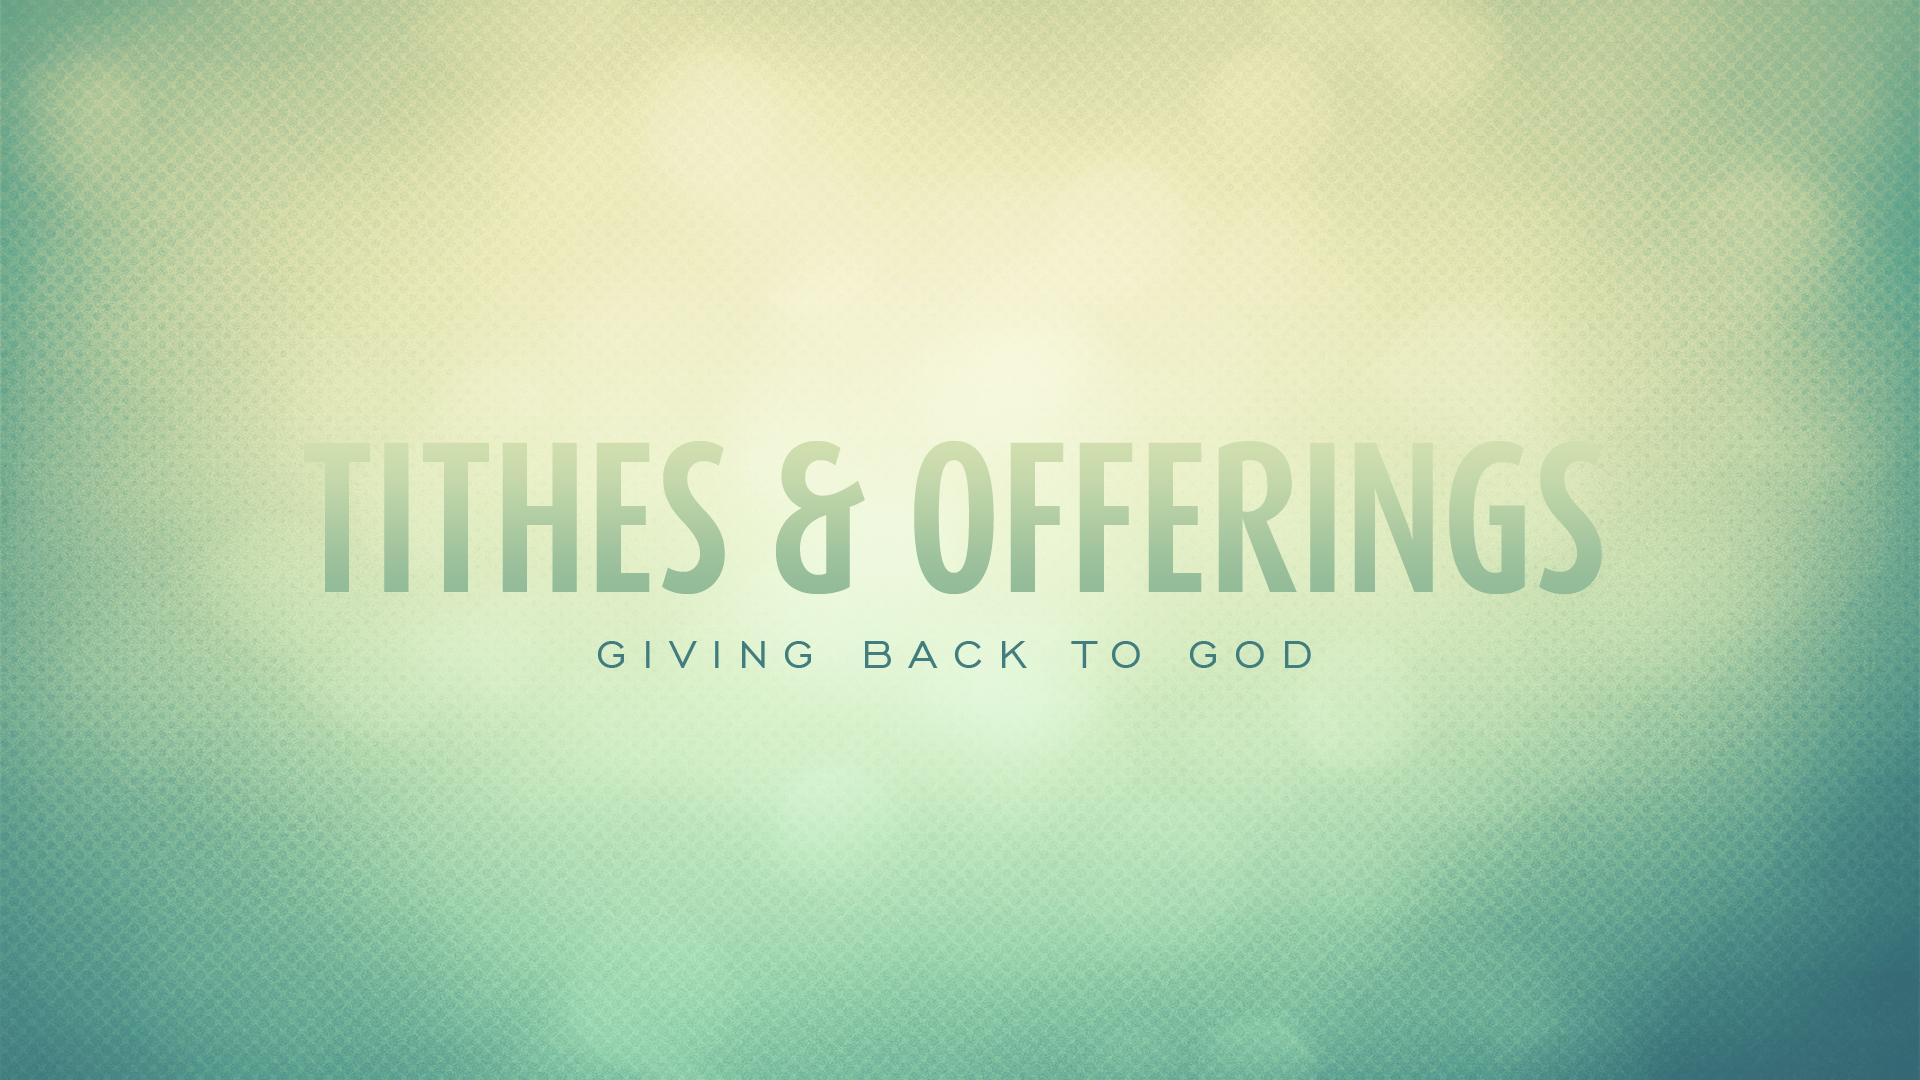 Offering-Tithe.jpg